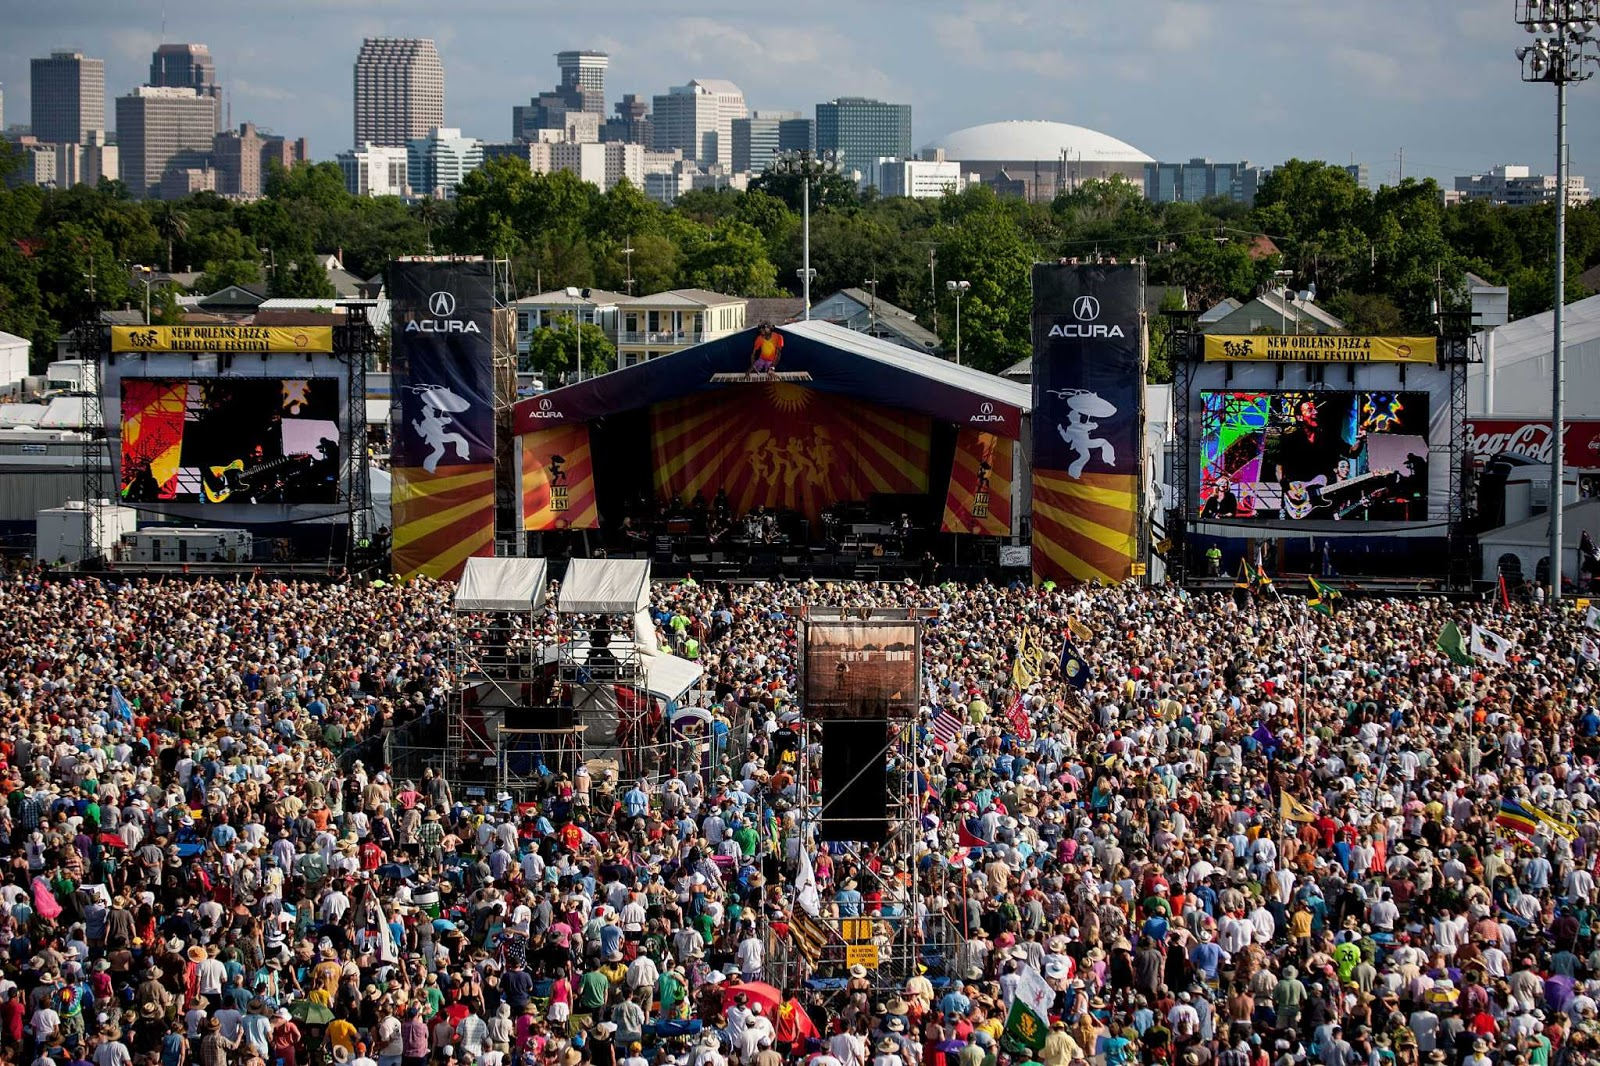 New Orleans Jazz & Heritage Festival: Nova Orleans